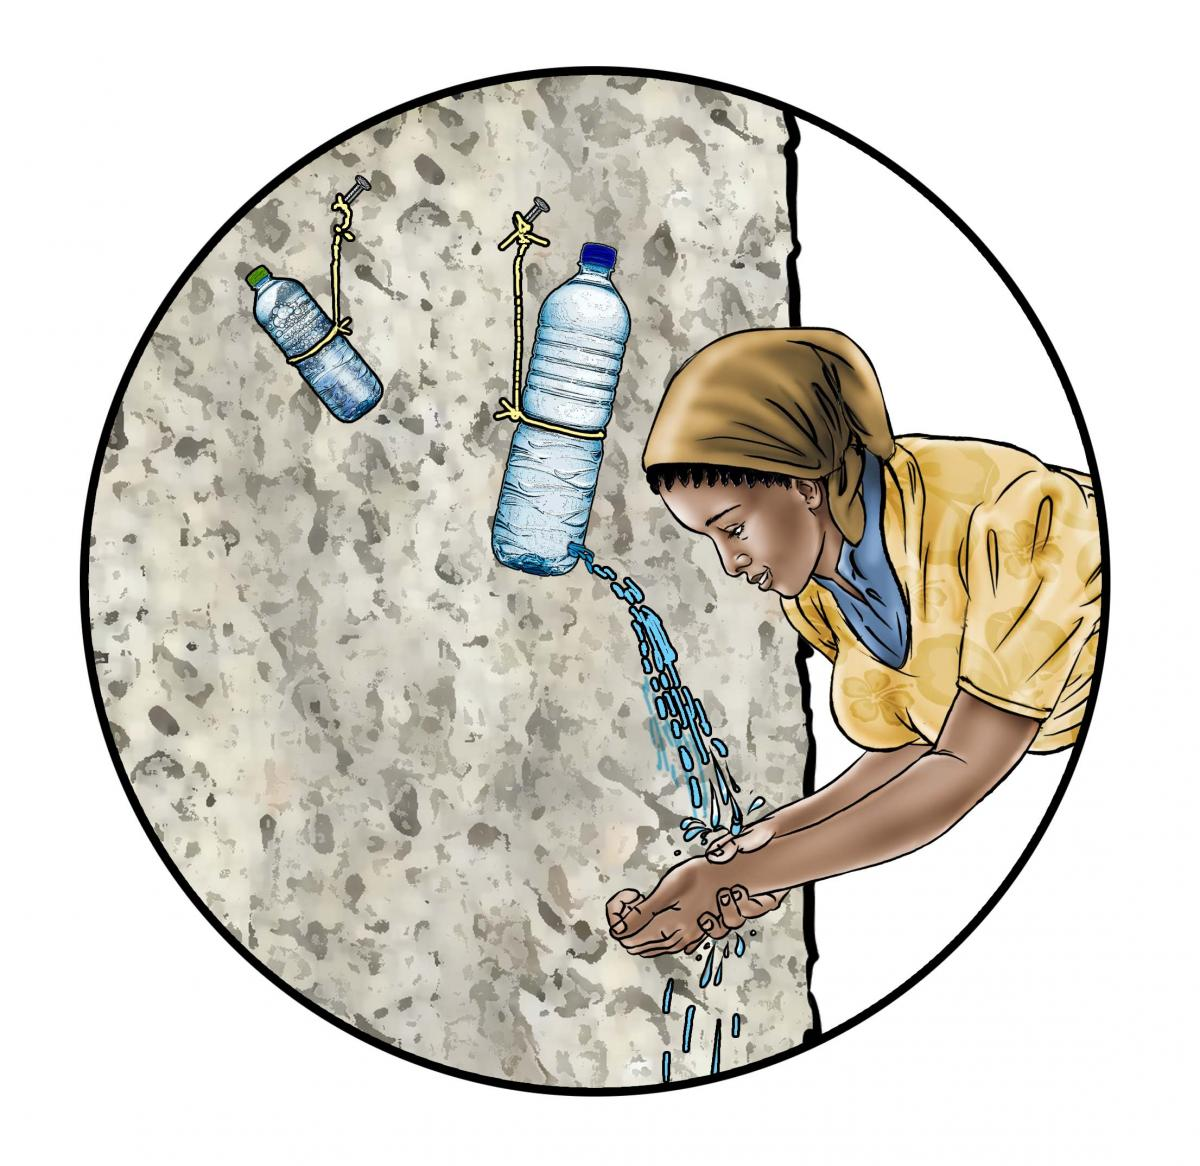 Hygiene - Handwashing - 04 - Sierra Leone